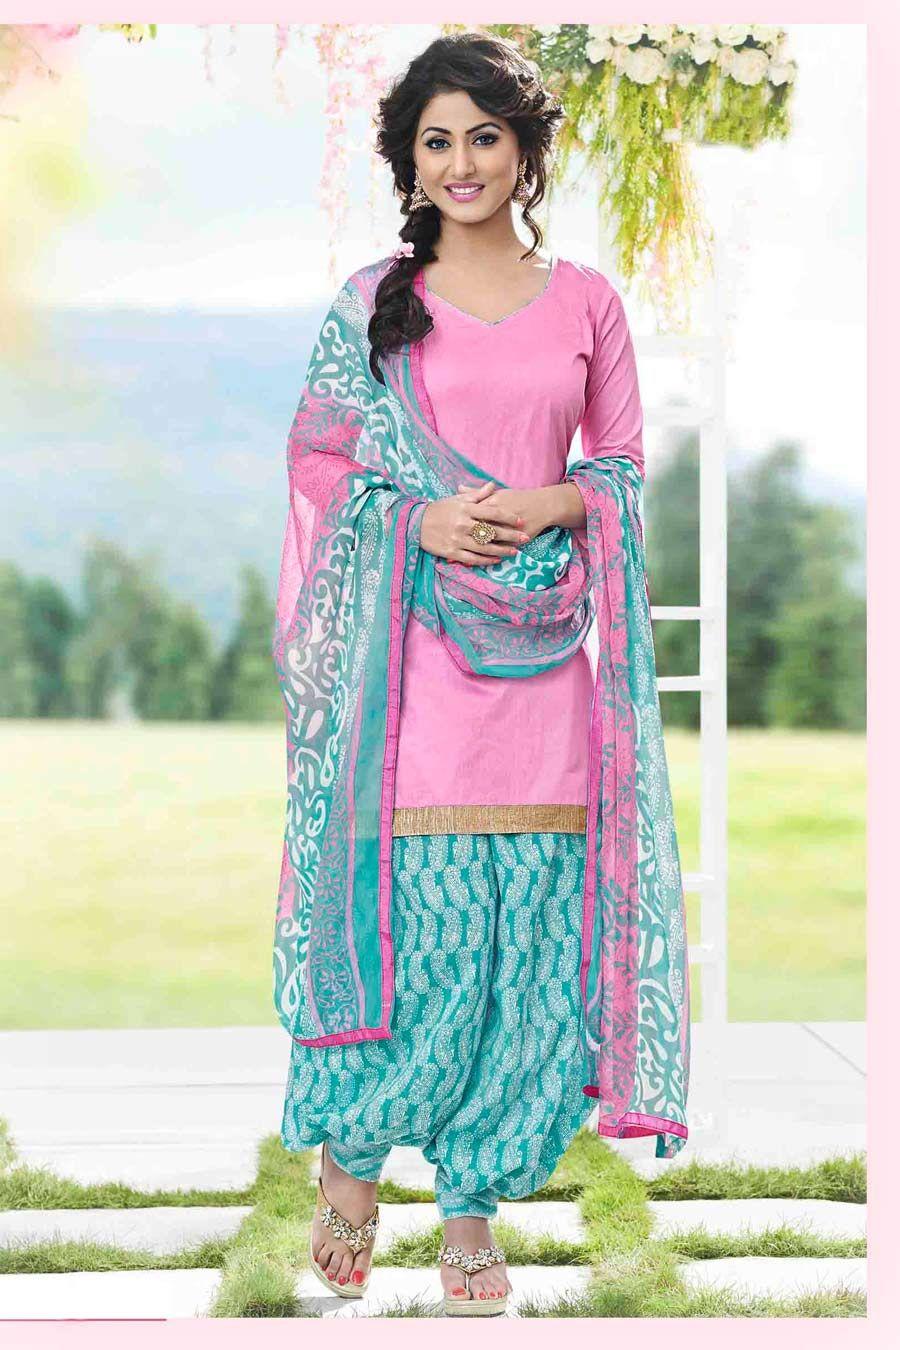 Pink & Aqua Unstitch Cotton Patiala Suit With Chiffon Dupatta ...